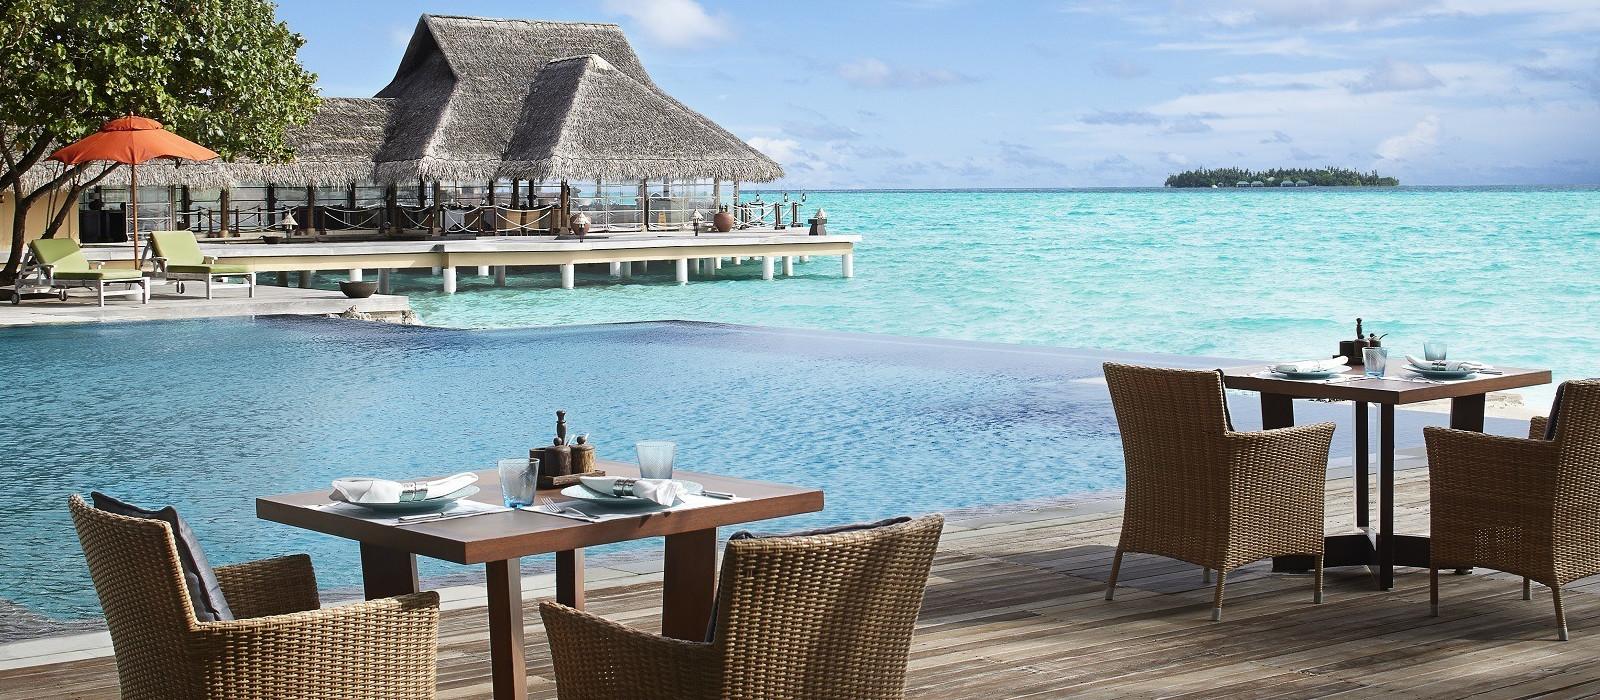 Sri Lanka & Malediven: Kulturelles Erbe & Luxuriös Urlaub 1